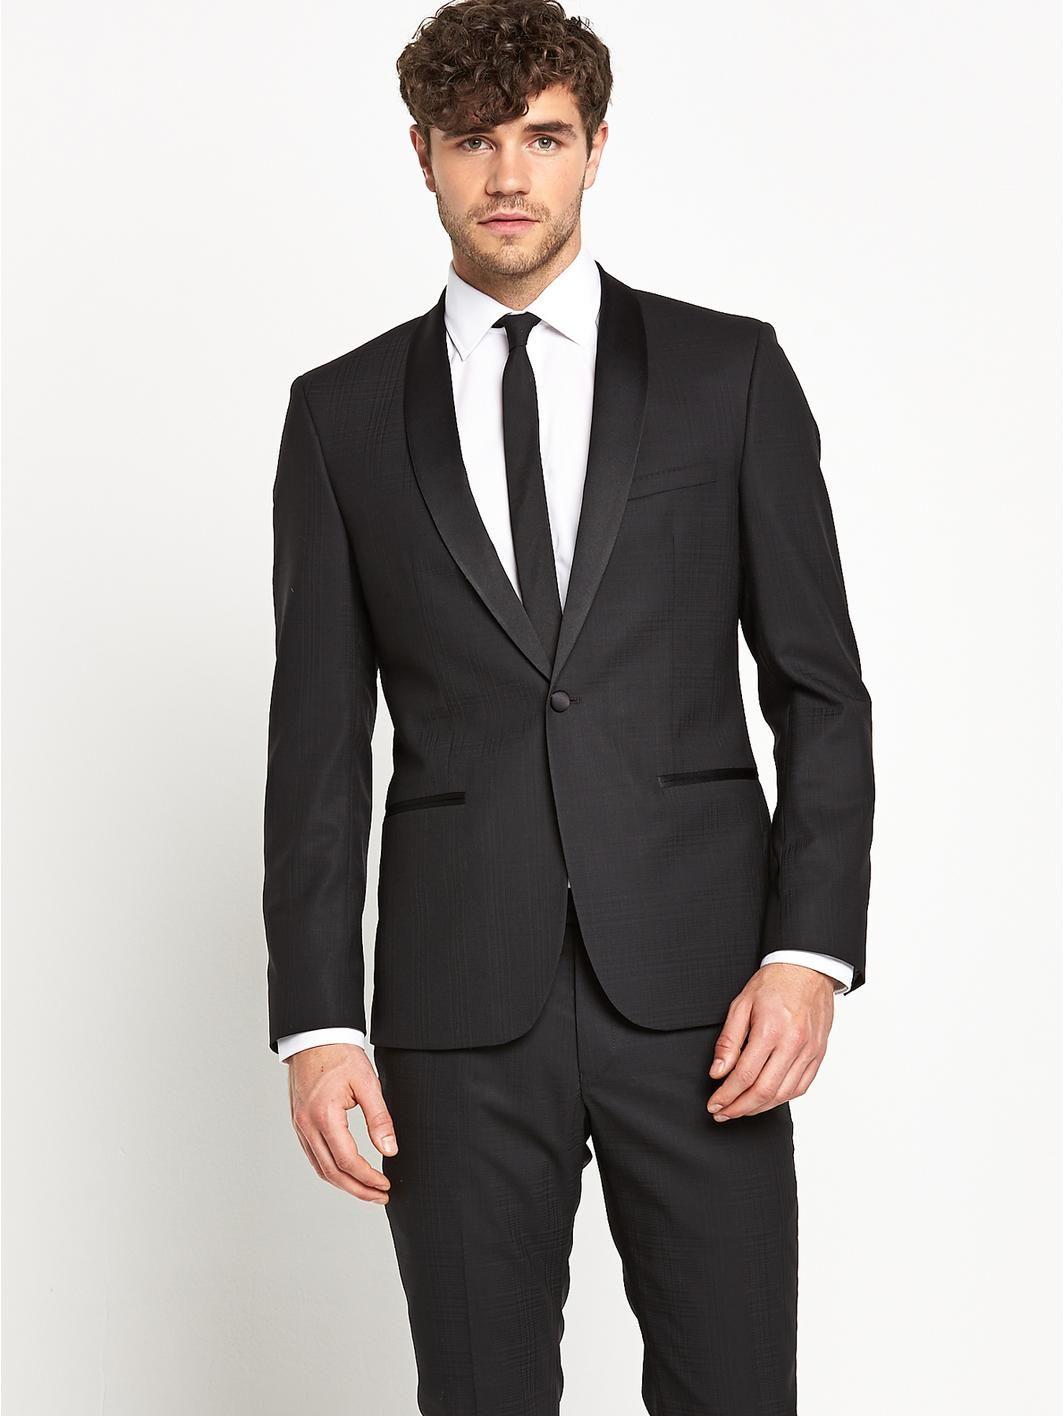 #VeryChristmasCrib Mens Check Dinner Suit Jacket, http://www.very.co.uk/ben-sherman-mens-check-dinner-suit-jacket/1453166466.prd